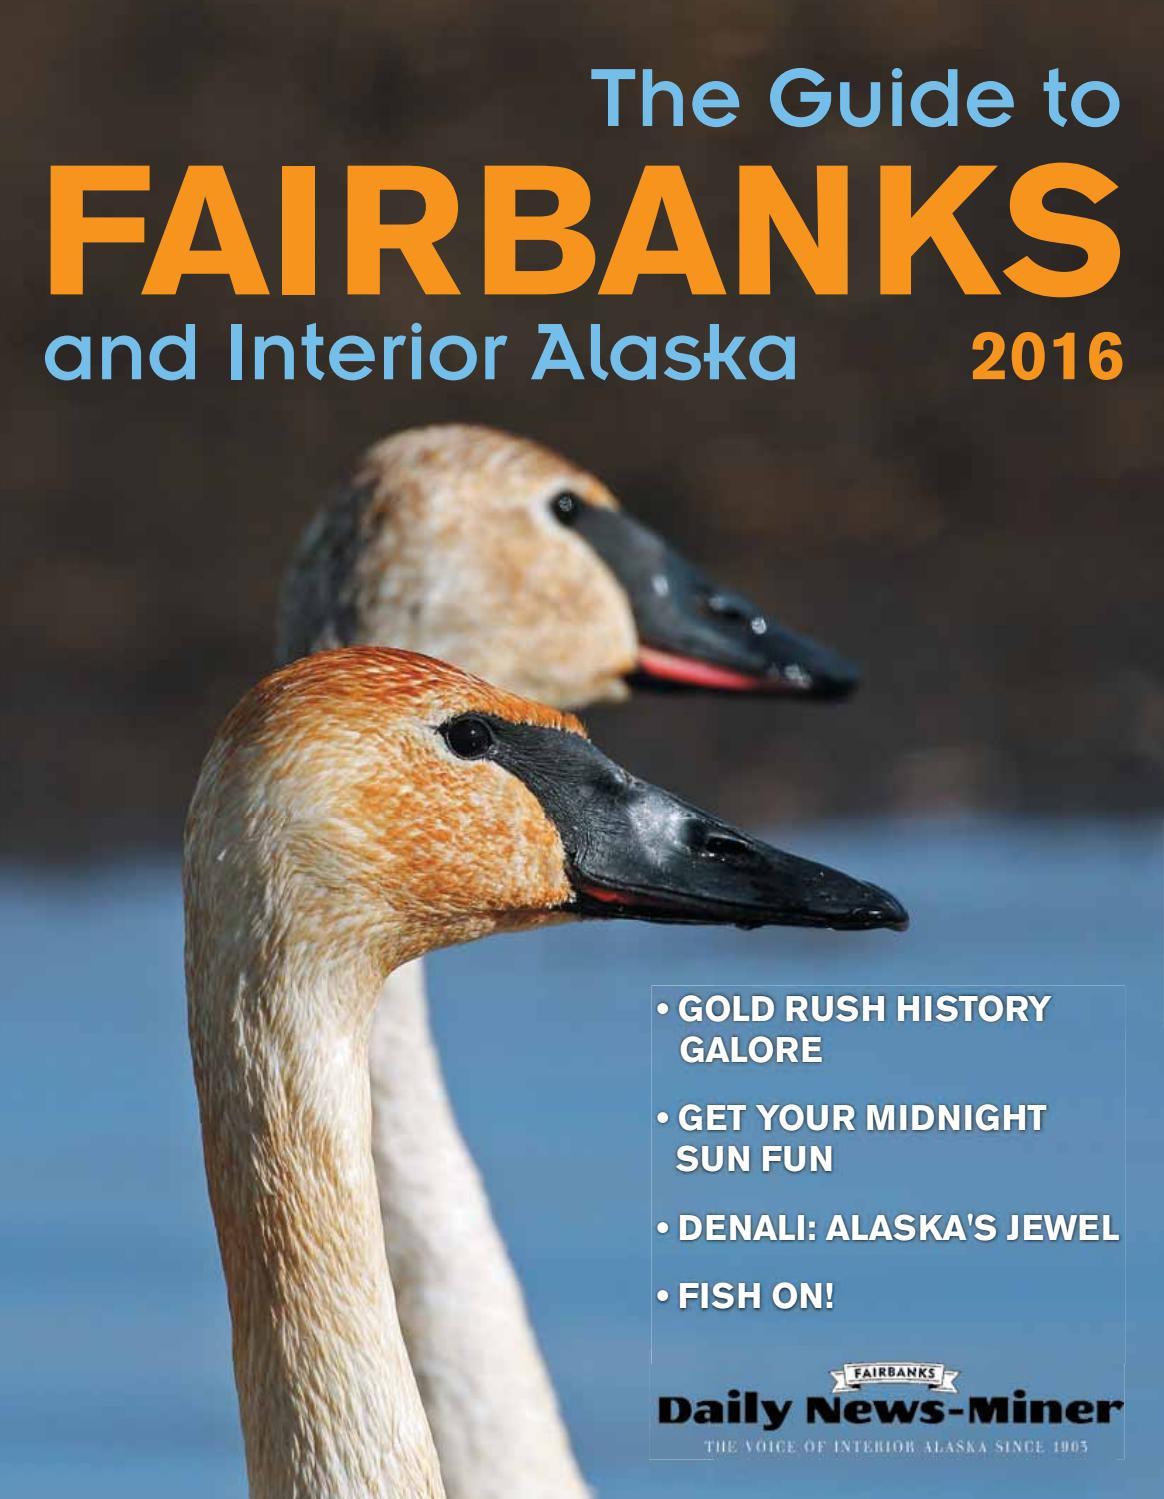 hook up in fairbanks